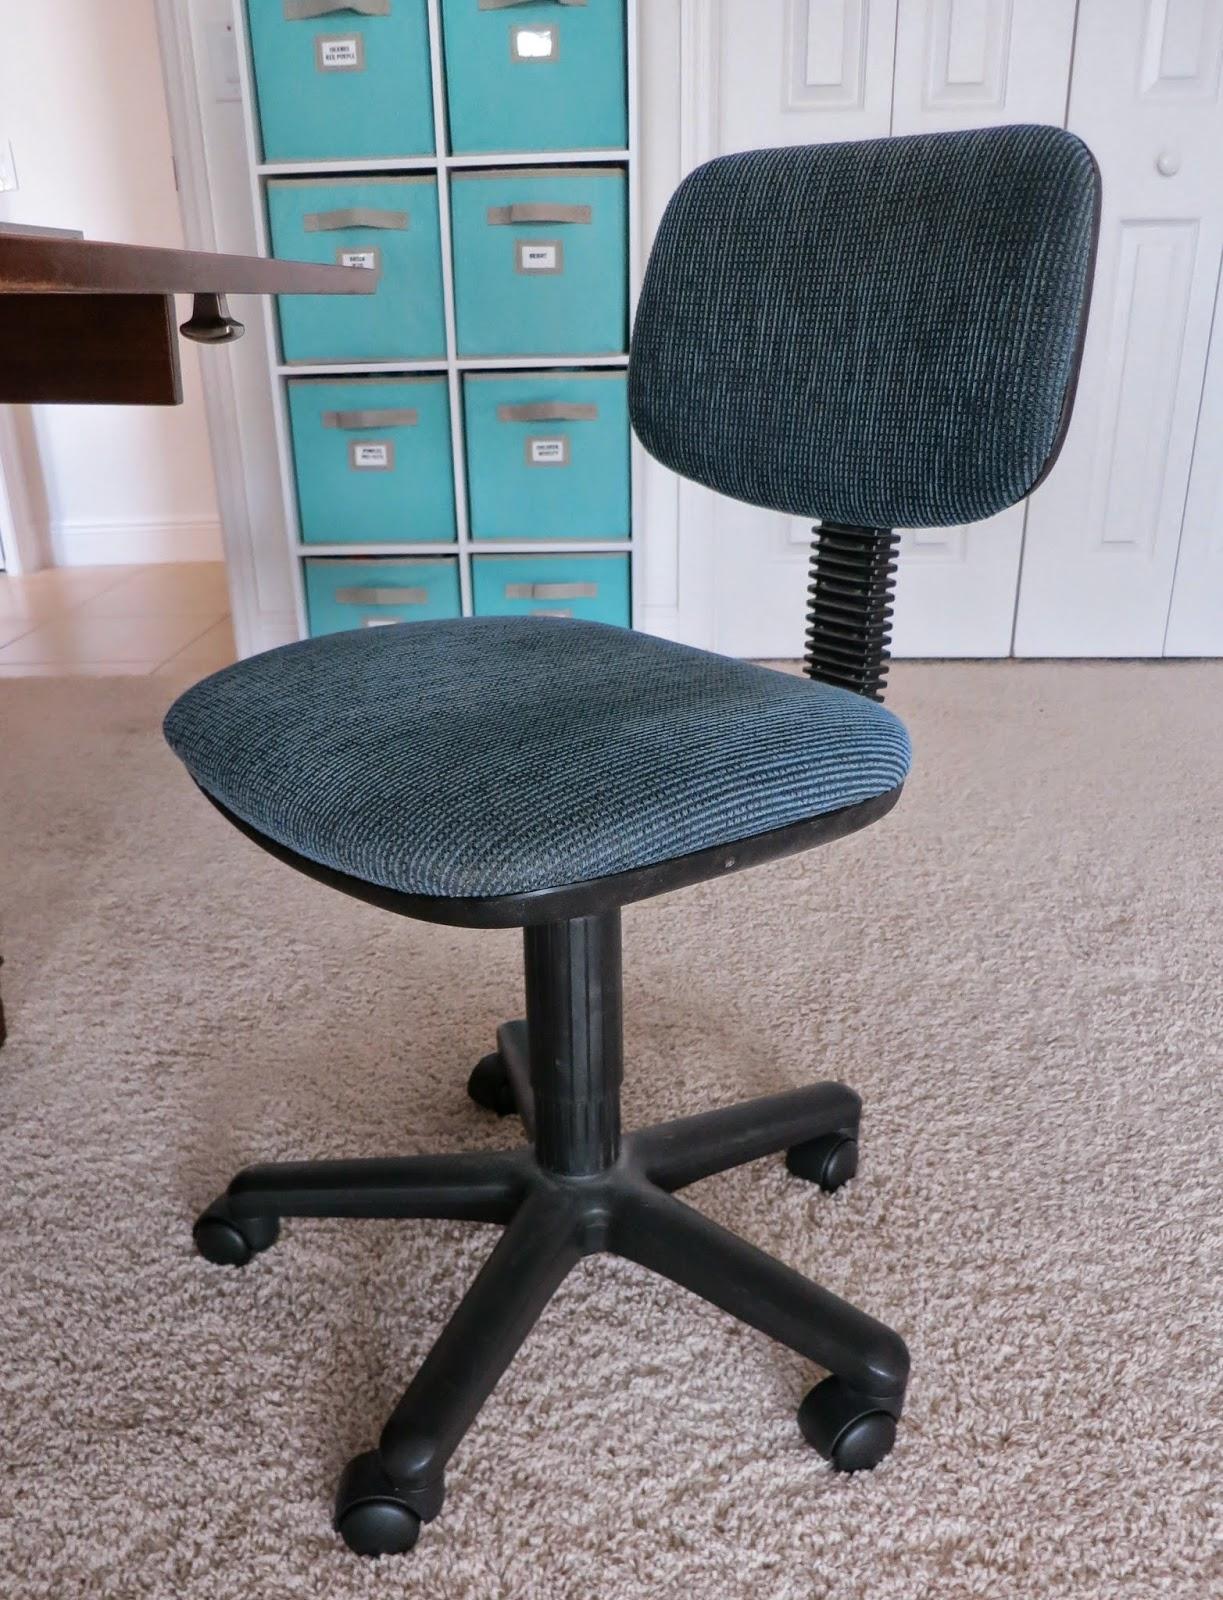 Flourishing Palms DIY Computer Chair